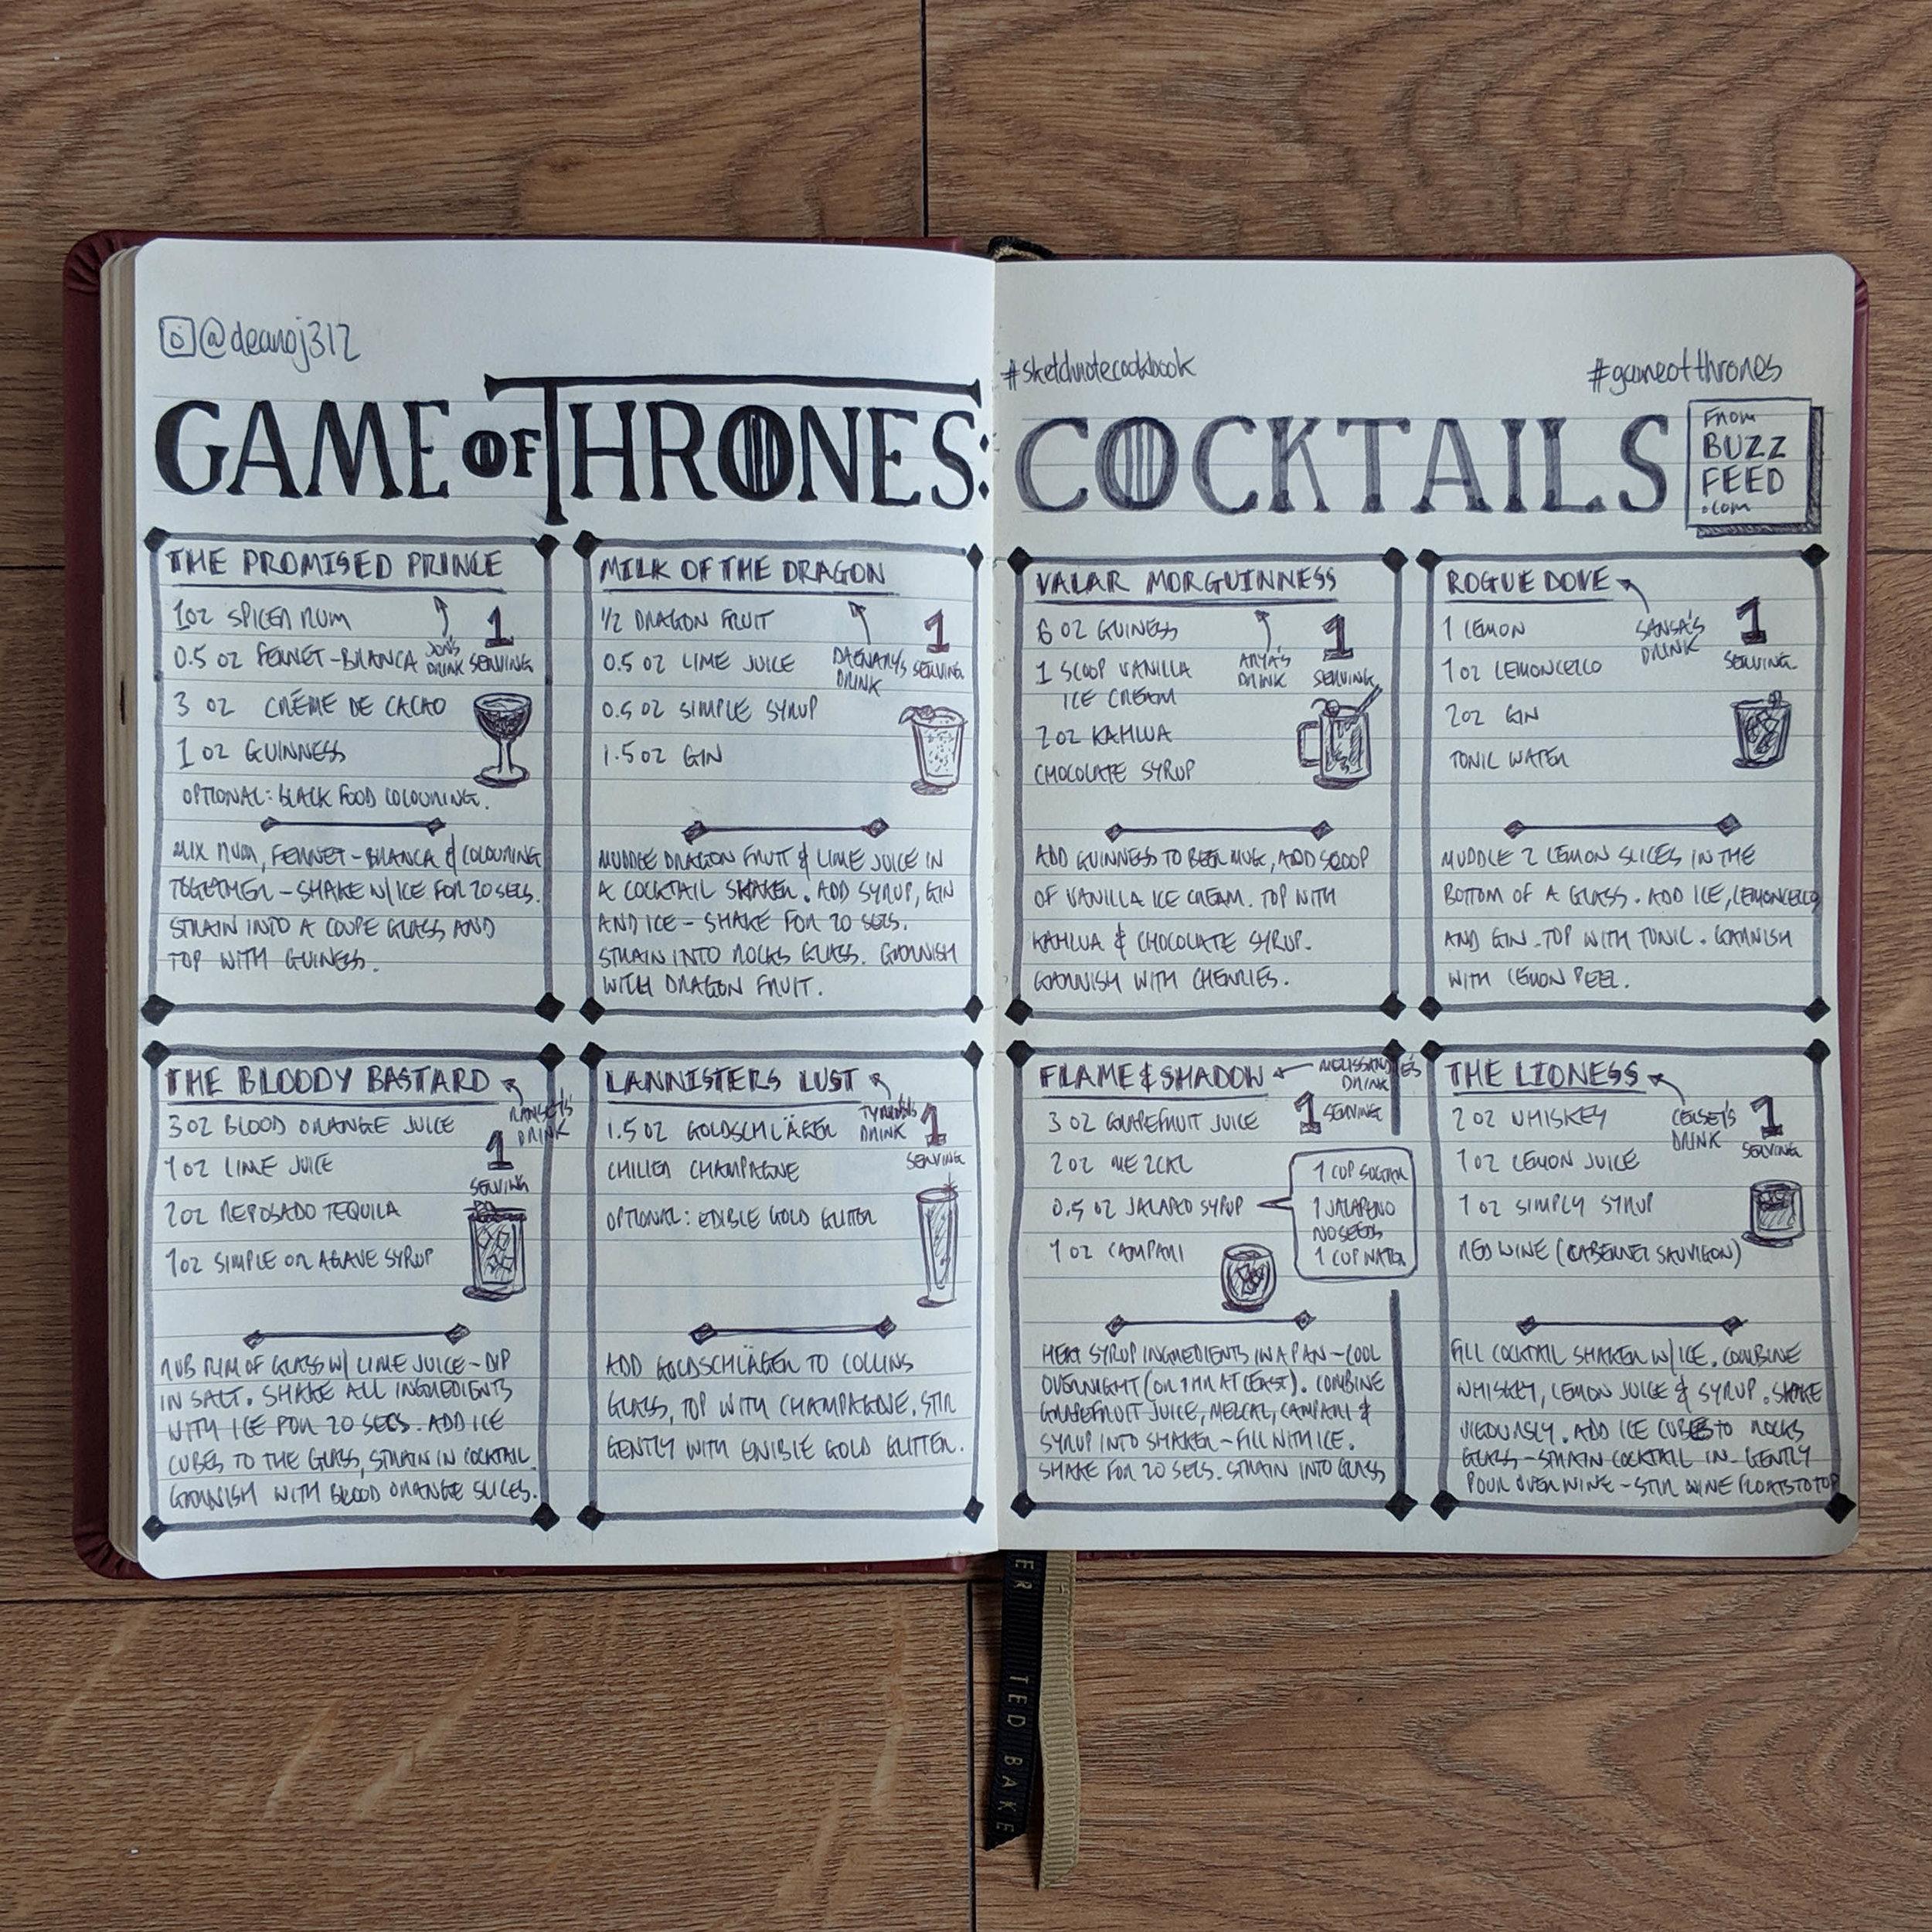 GameofThrones-Cocktails1.jpg